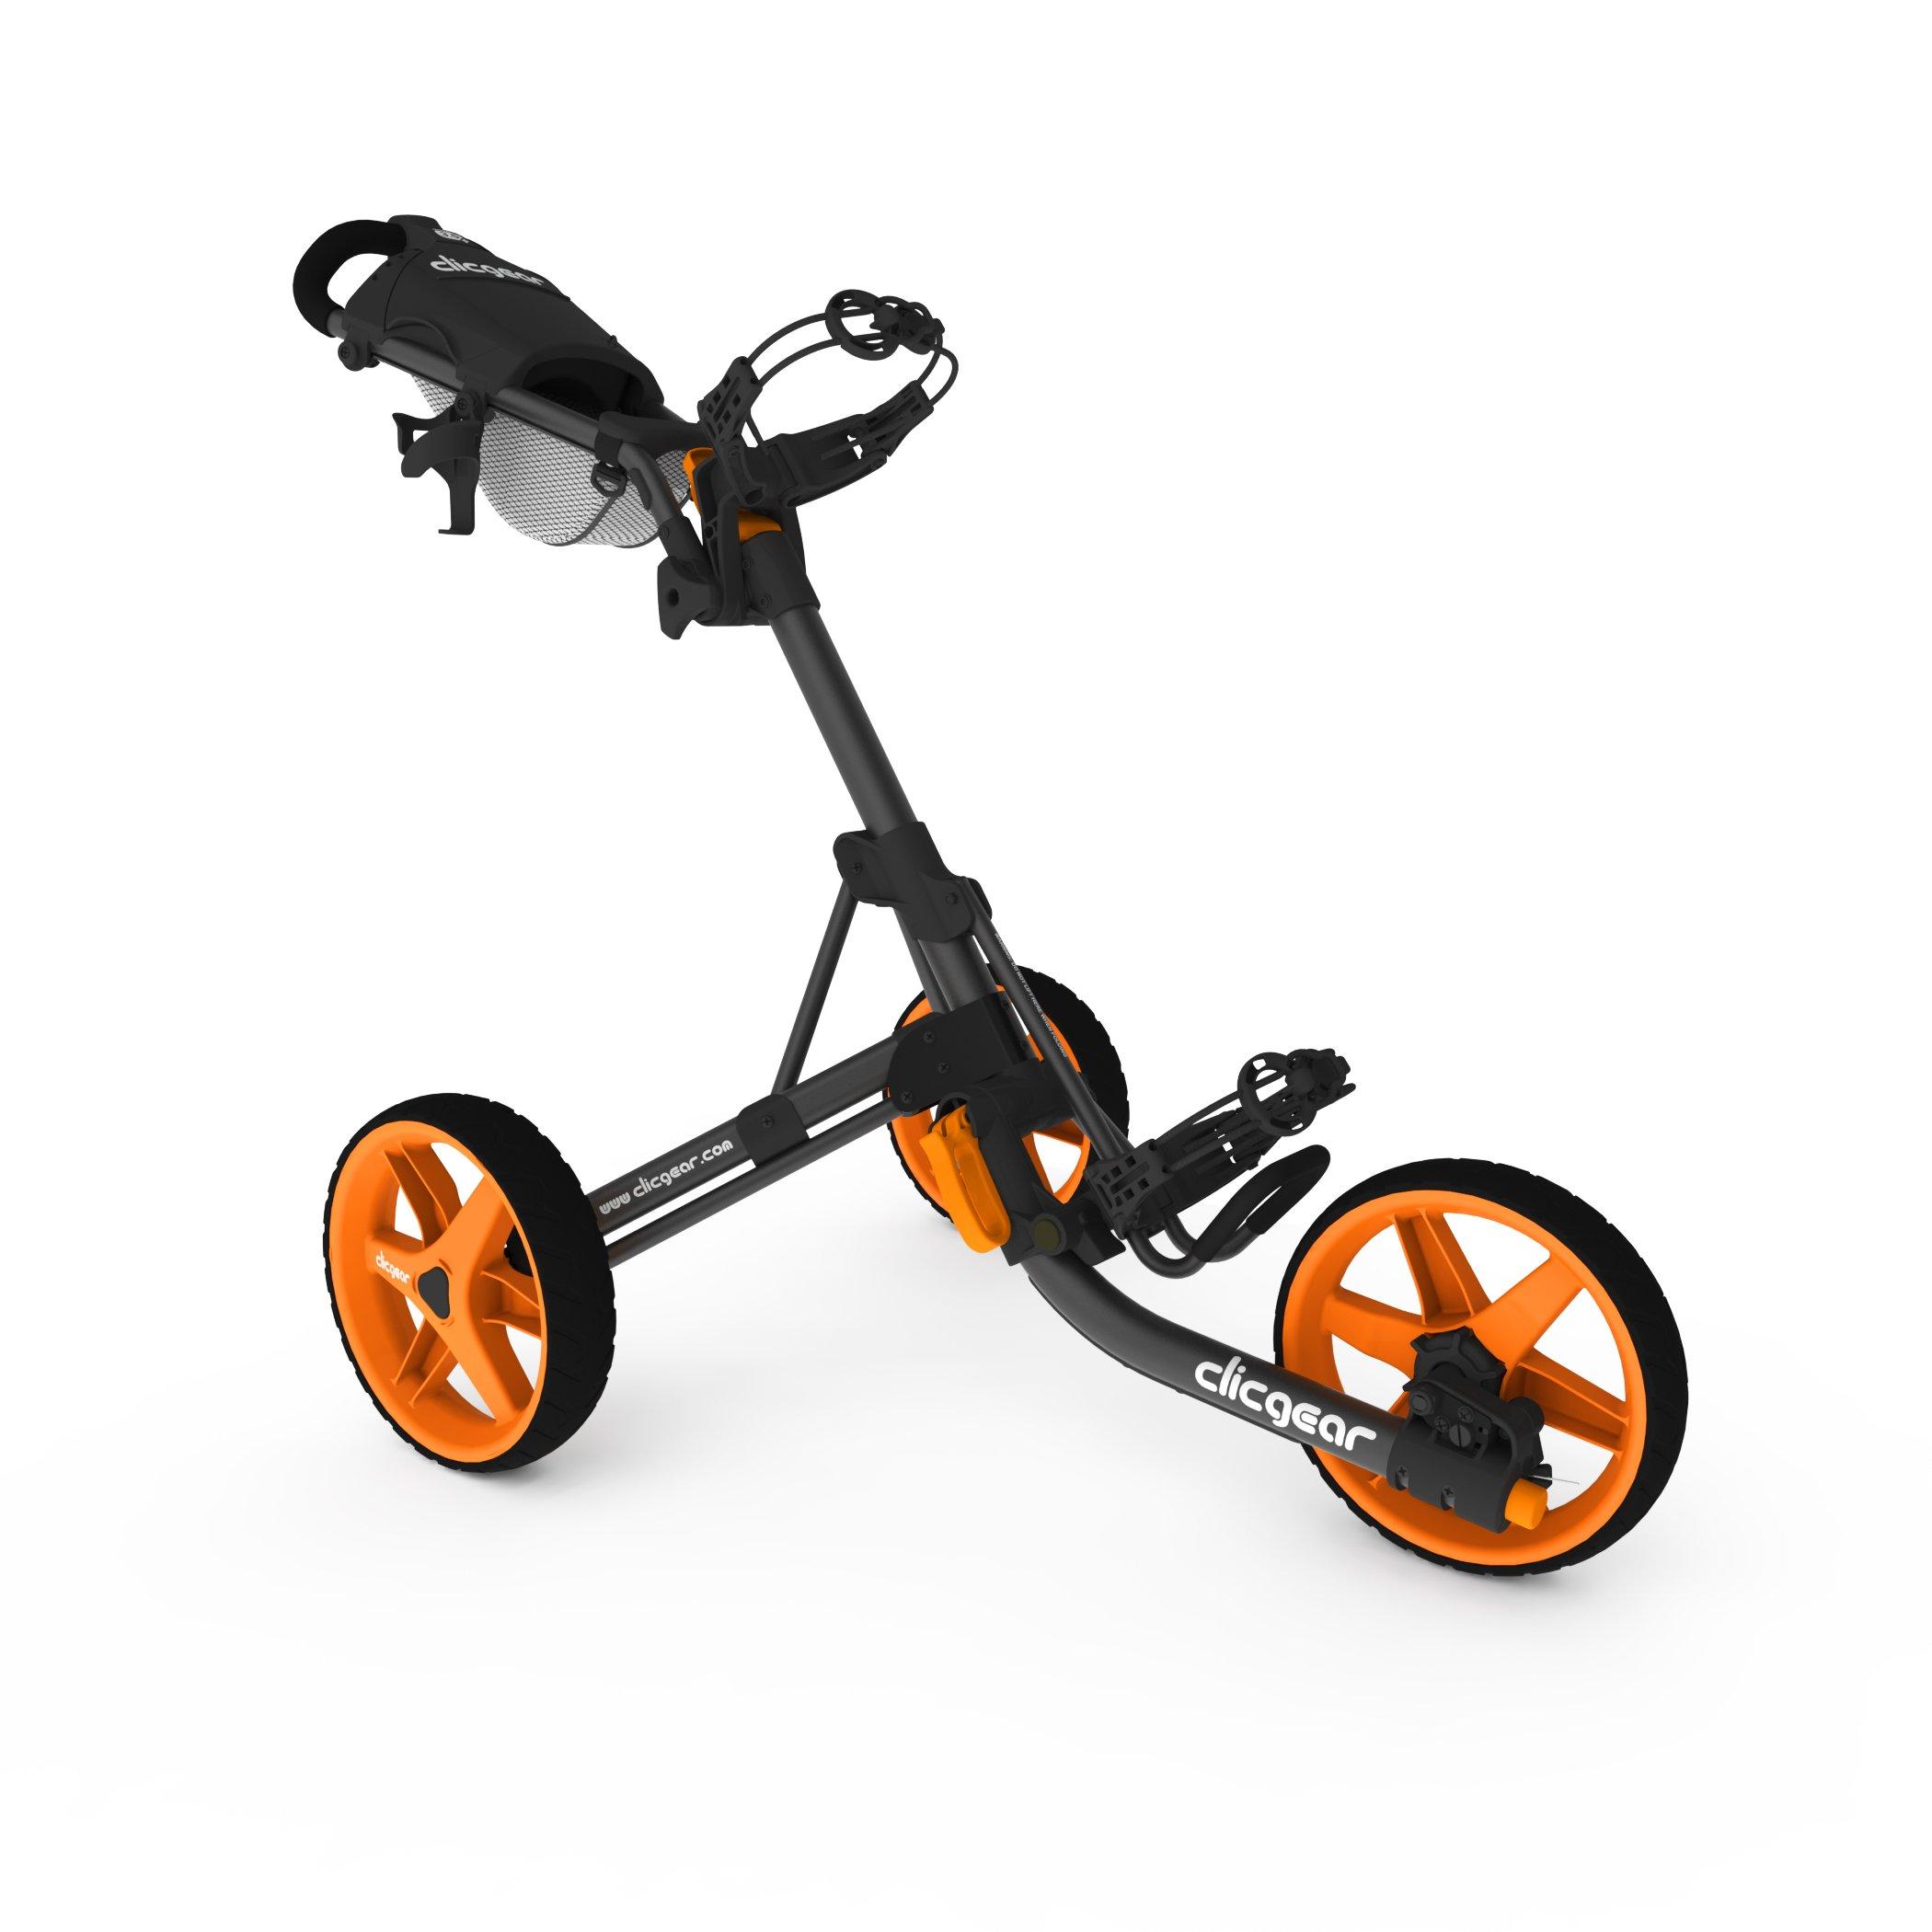 Clicgear Model 3.5+ | 3-Wheel Golf Push Cart  (Charcoal/Orange) by Clicgear